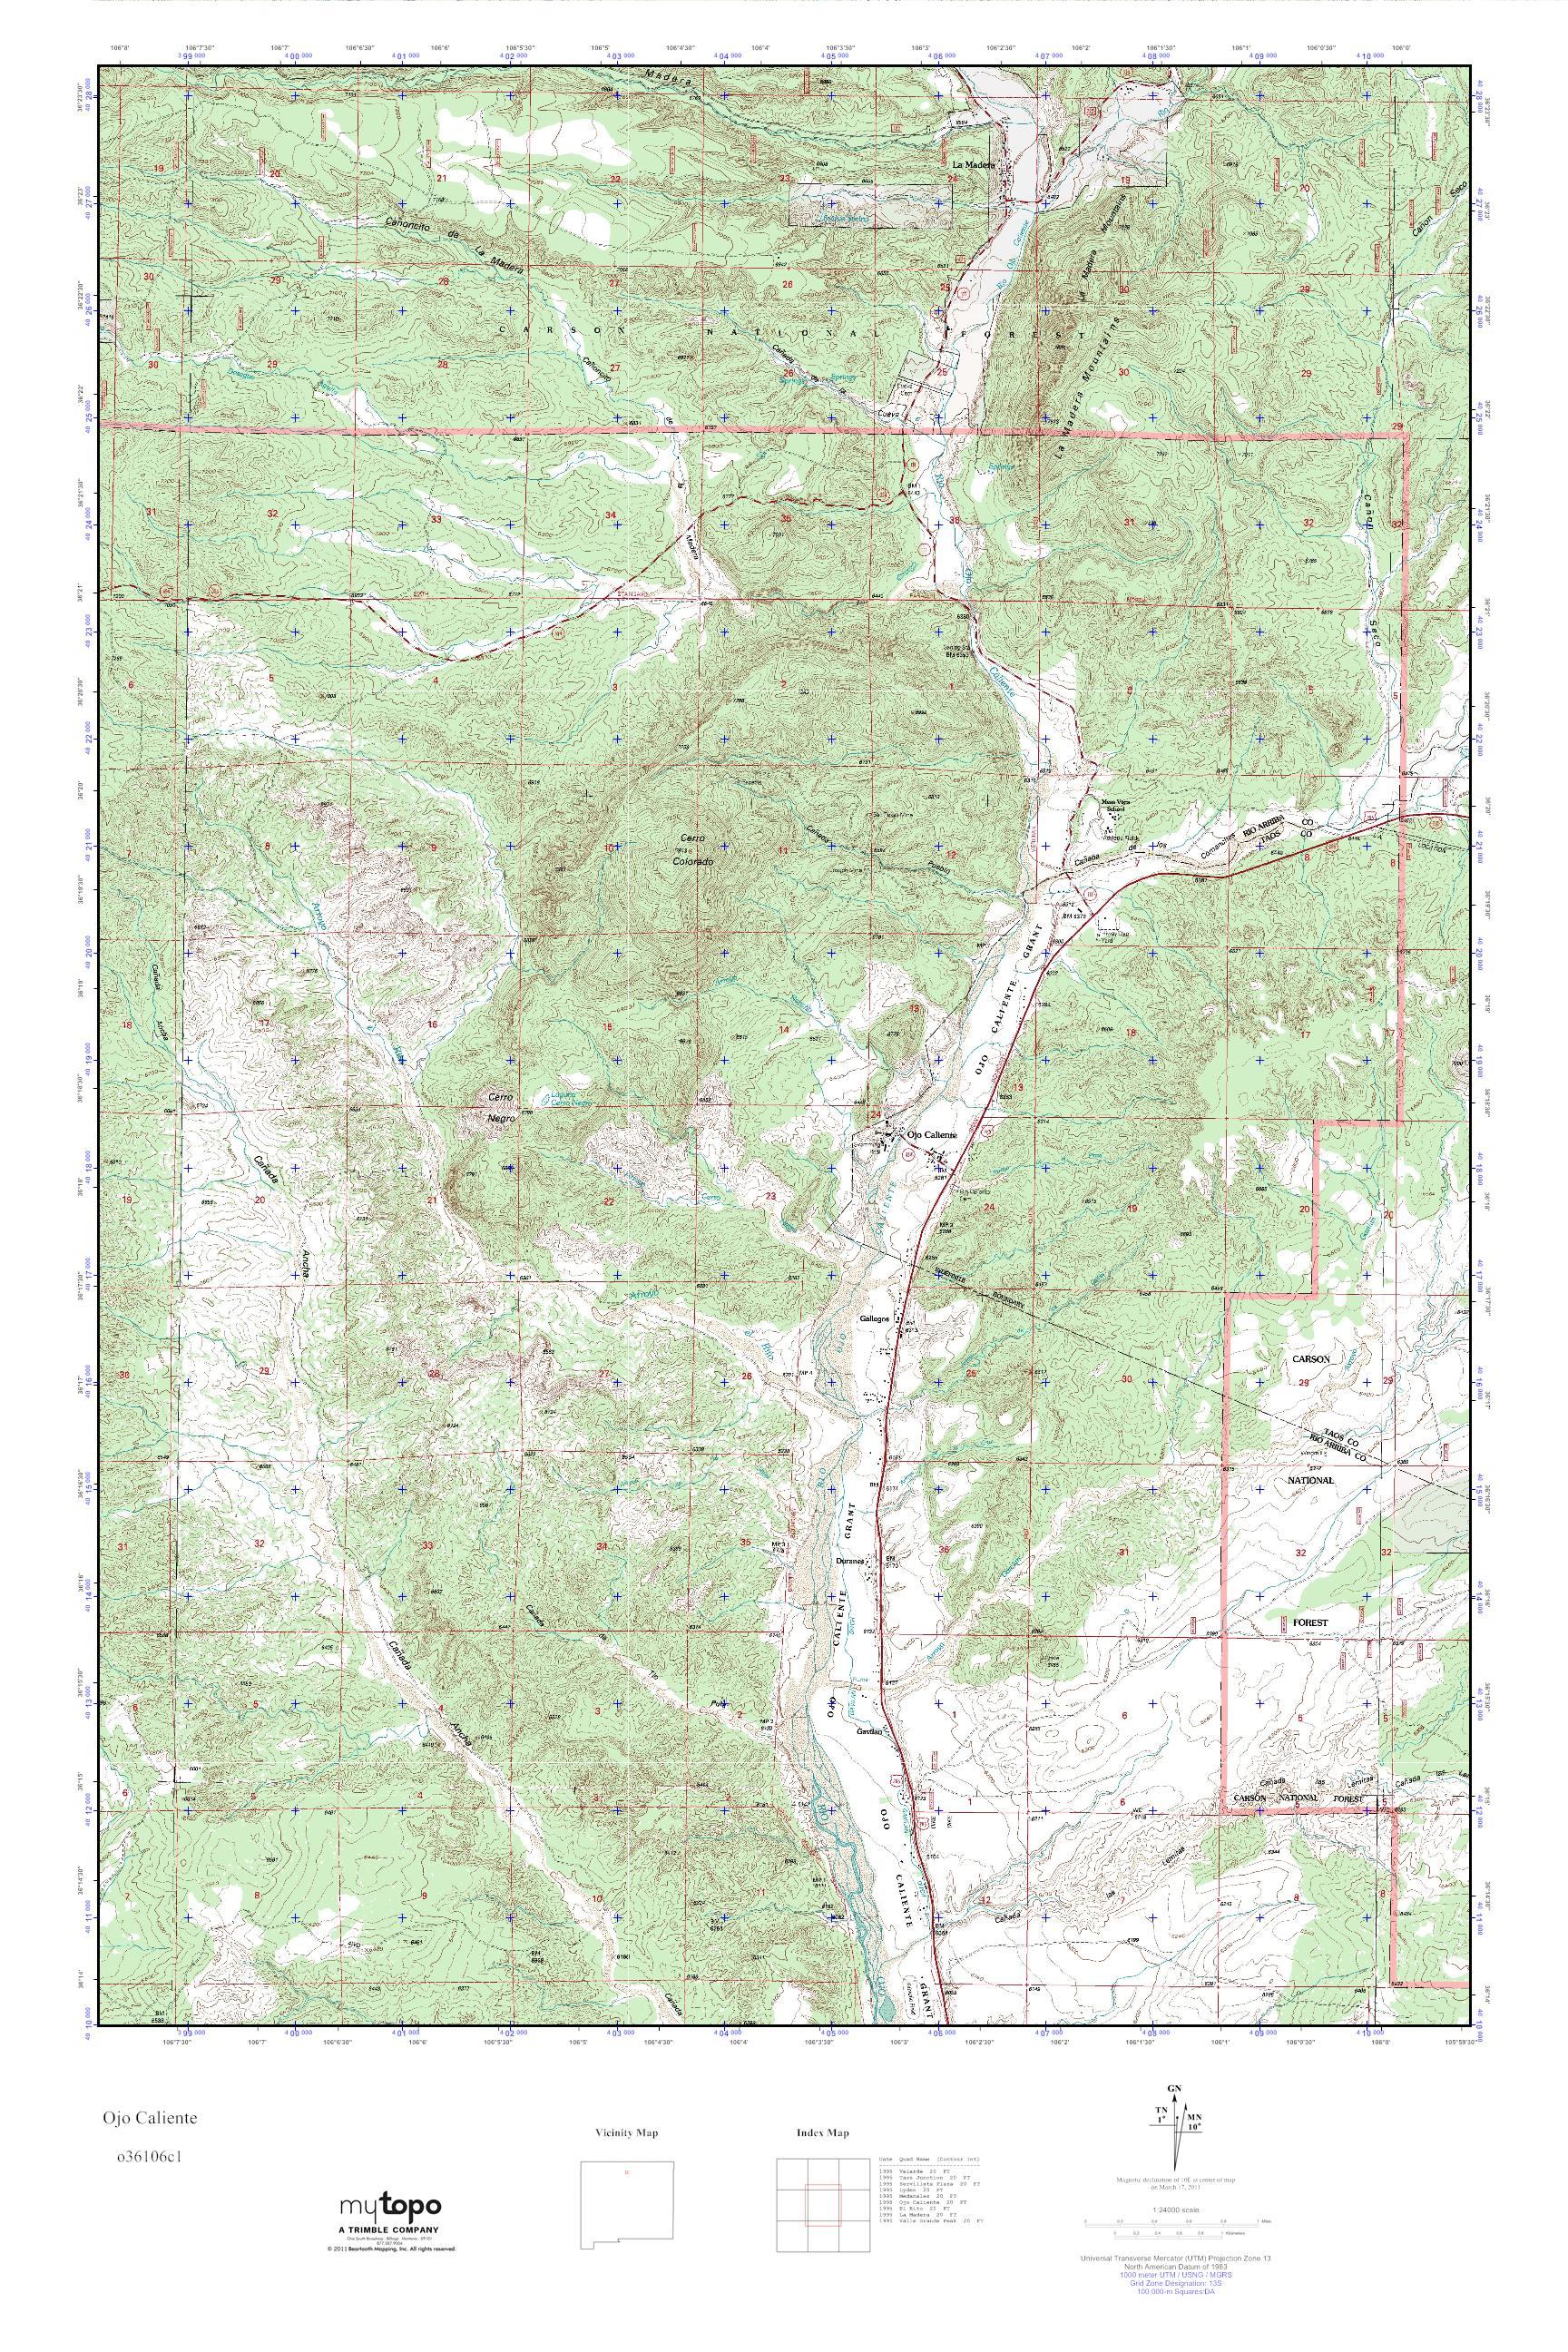 Ojo Caliente New Mexico Map.Mytopo Ojo Caliente New Mexico Usgs Quad Topo Map